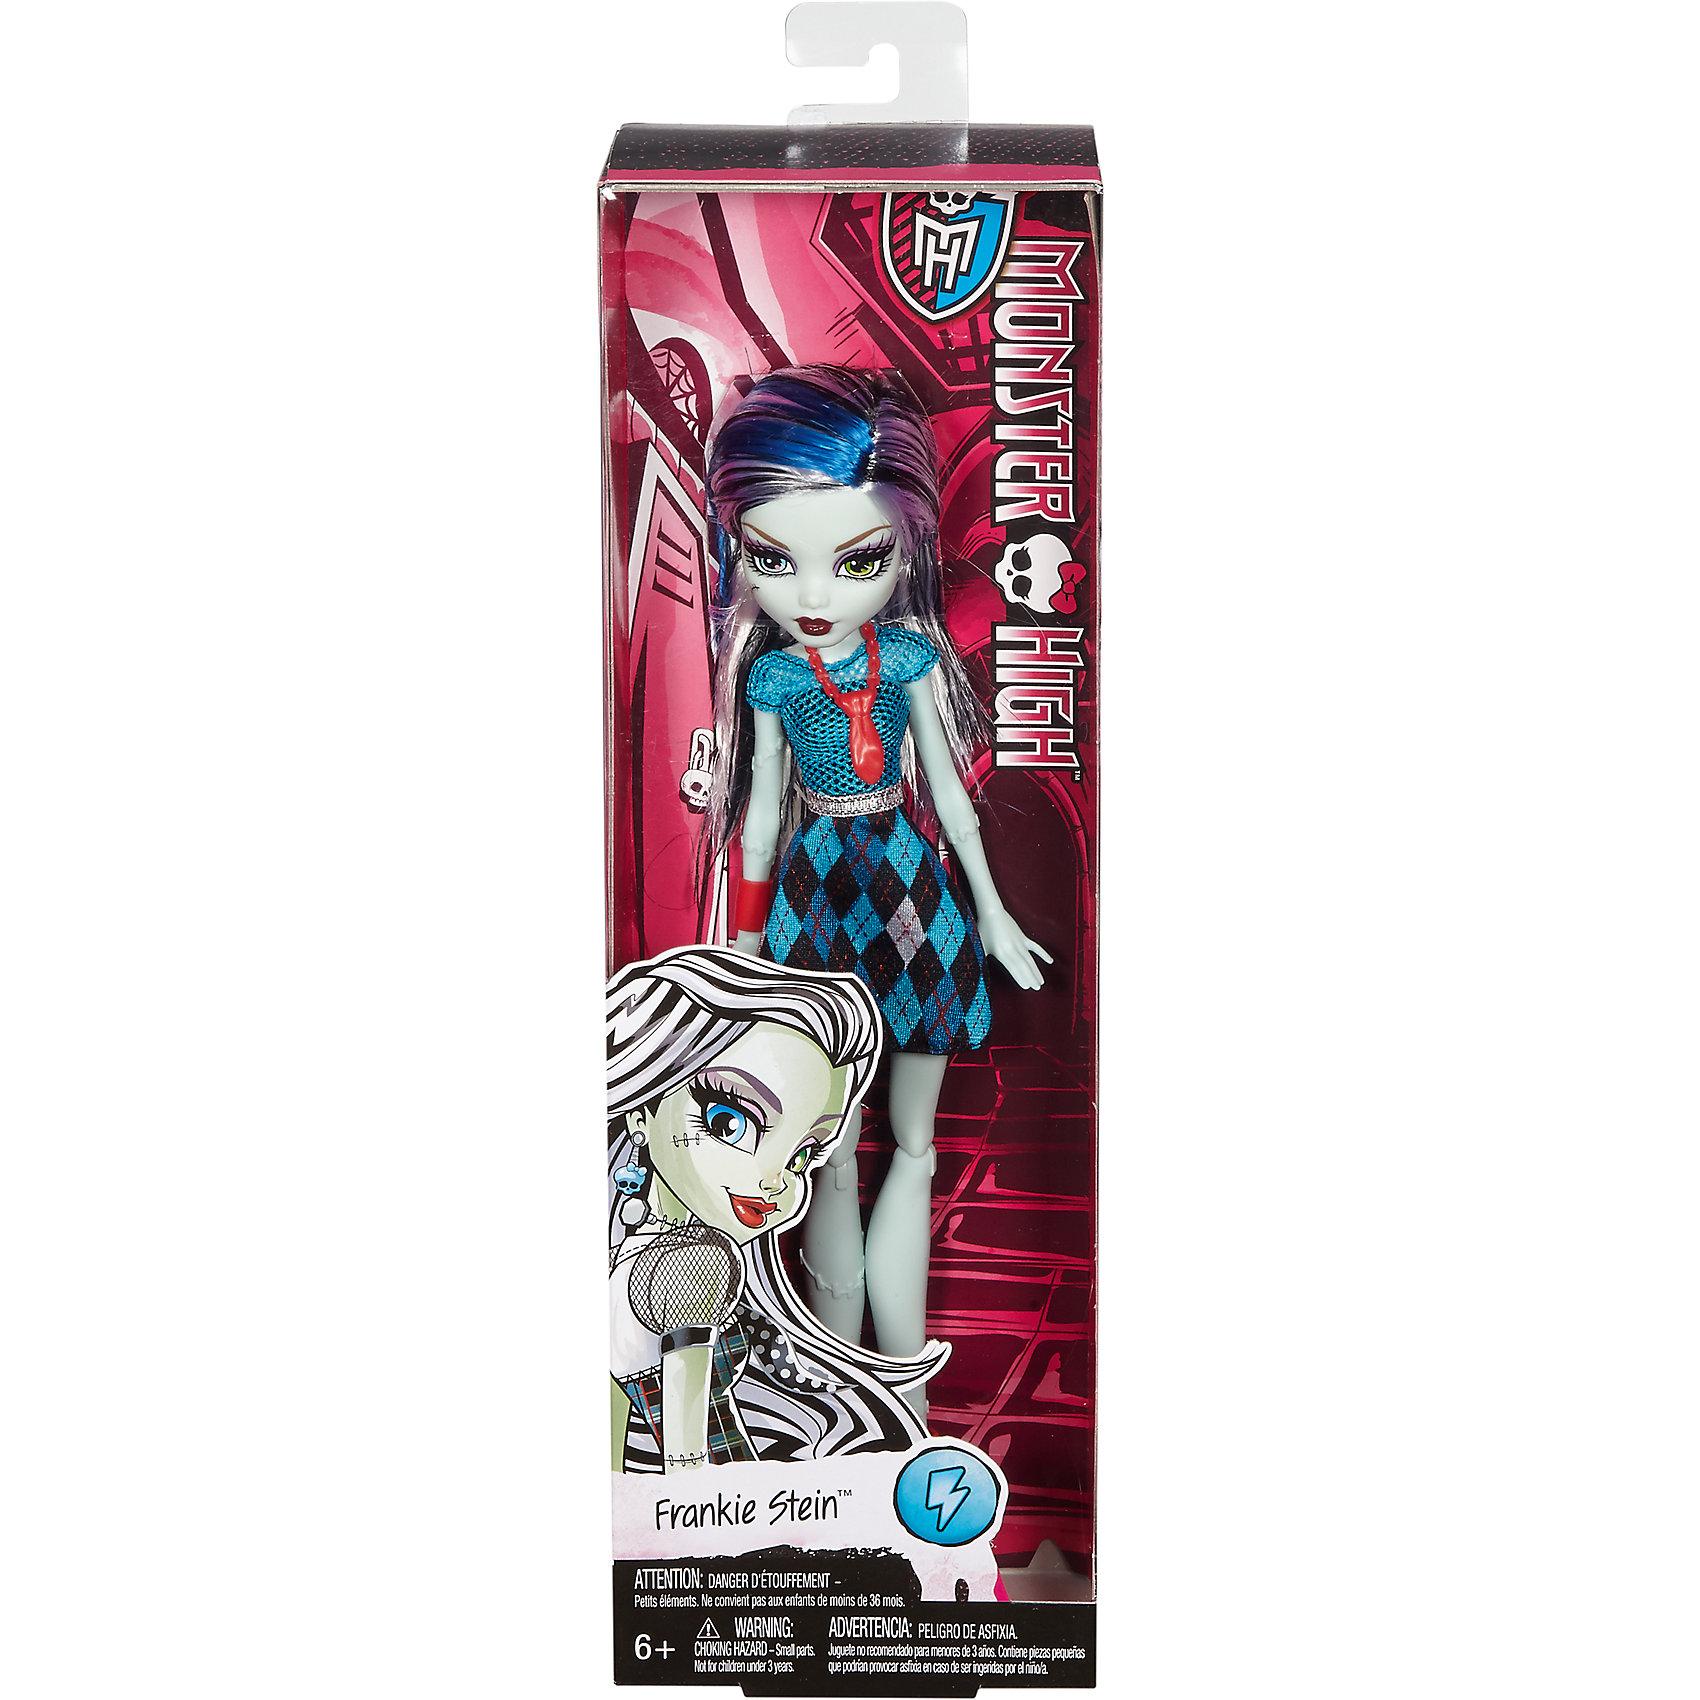 Mattel Базовая кукла Фрэнки Штейн Monster High mattel кукла фрэнки штейн в модном наряде monster high